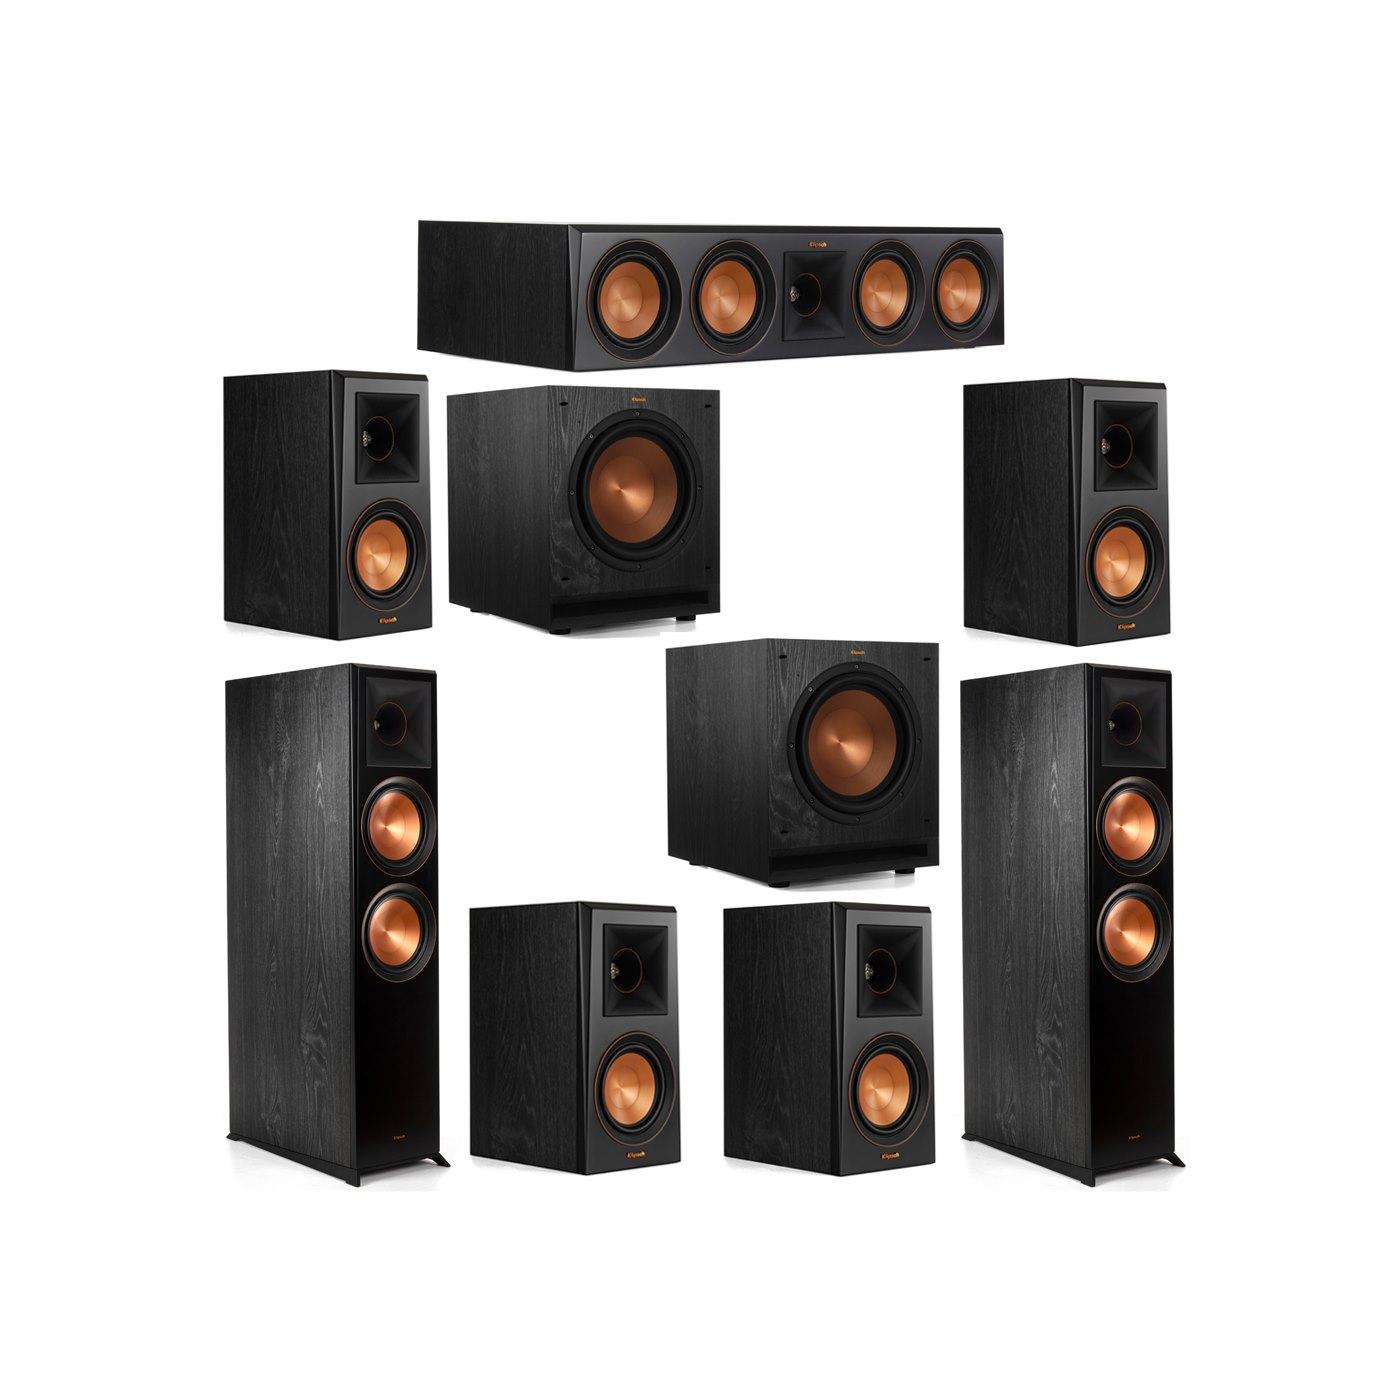 Klipsch 7.2 System with 2 RP-8000F Floorstanding Speakers, 1 Klipsch RP-504C Center Speaker, 4 Klipsch RP-500M Surround Speakers, 2 Klipsch SPL-100 Subwoofers